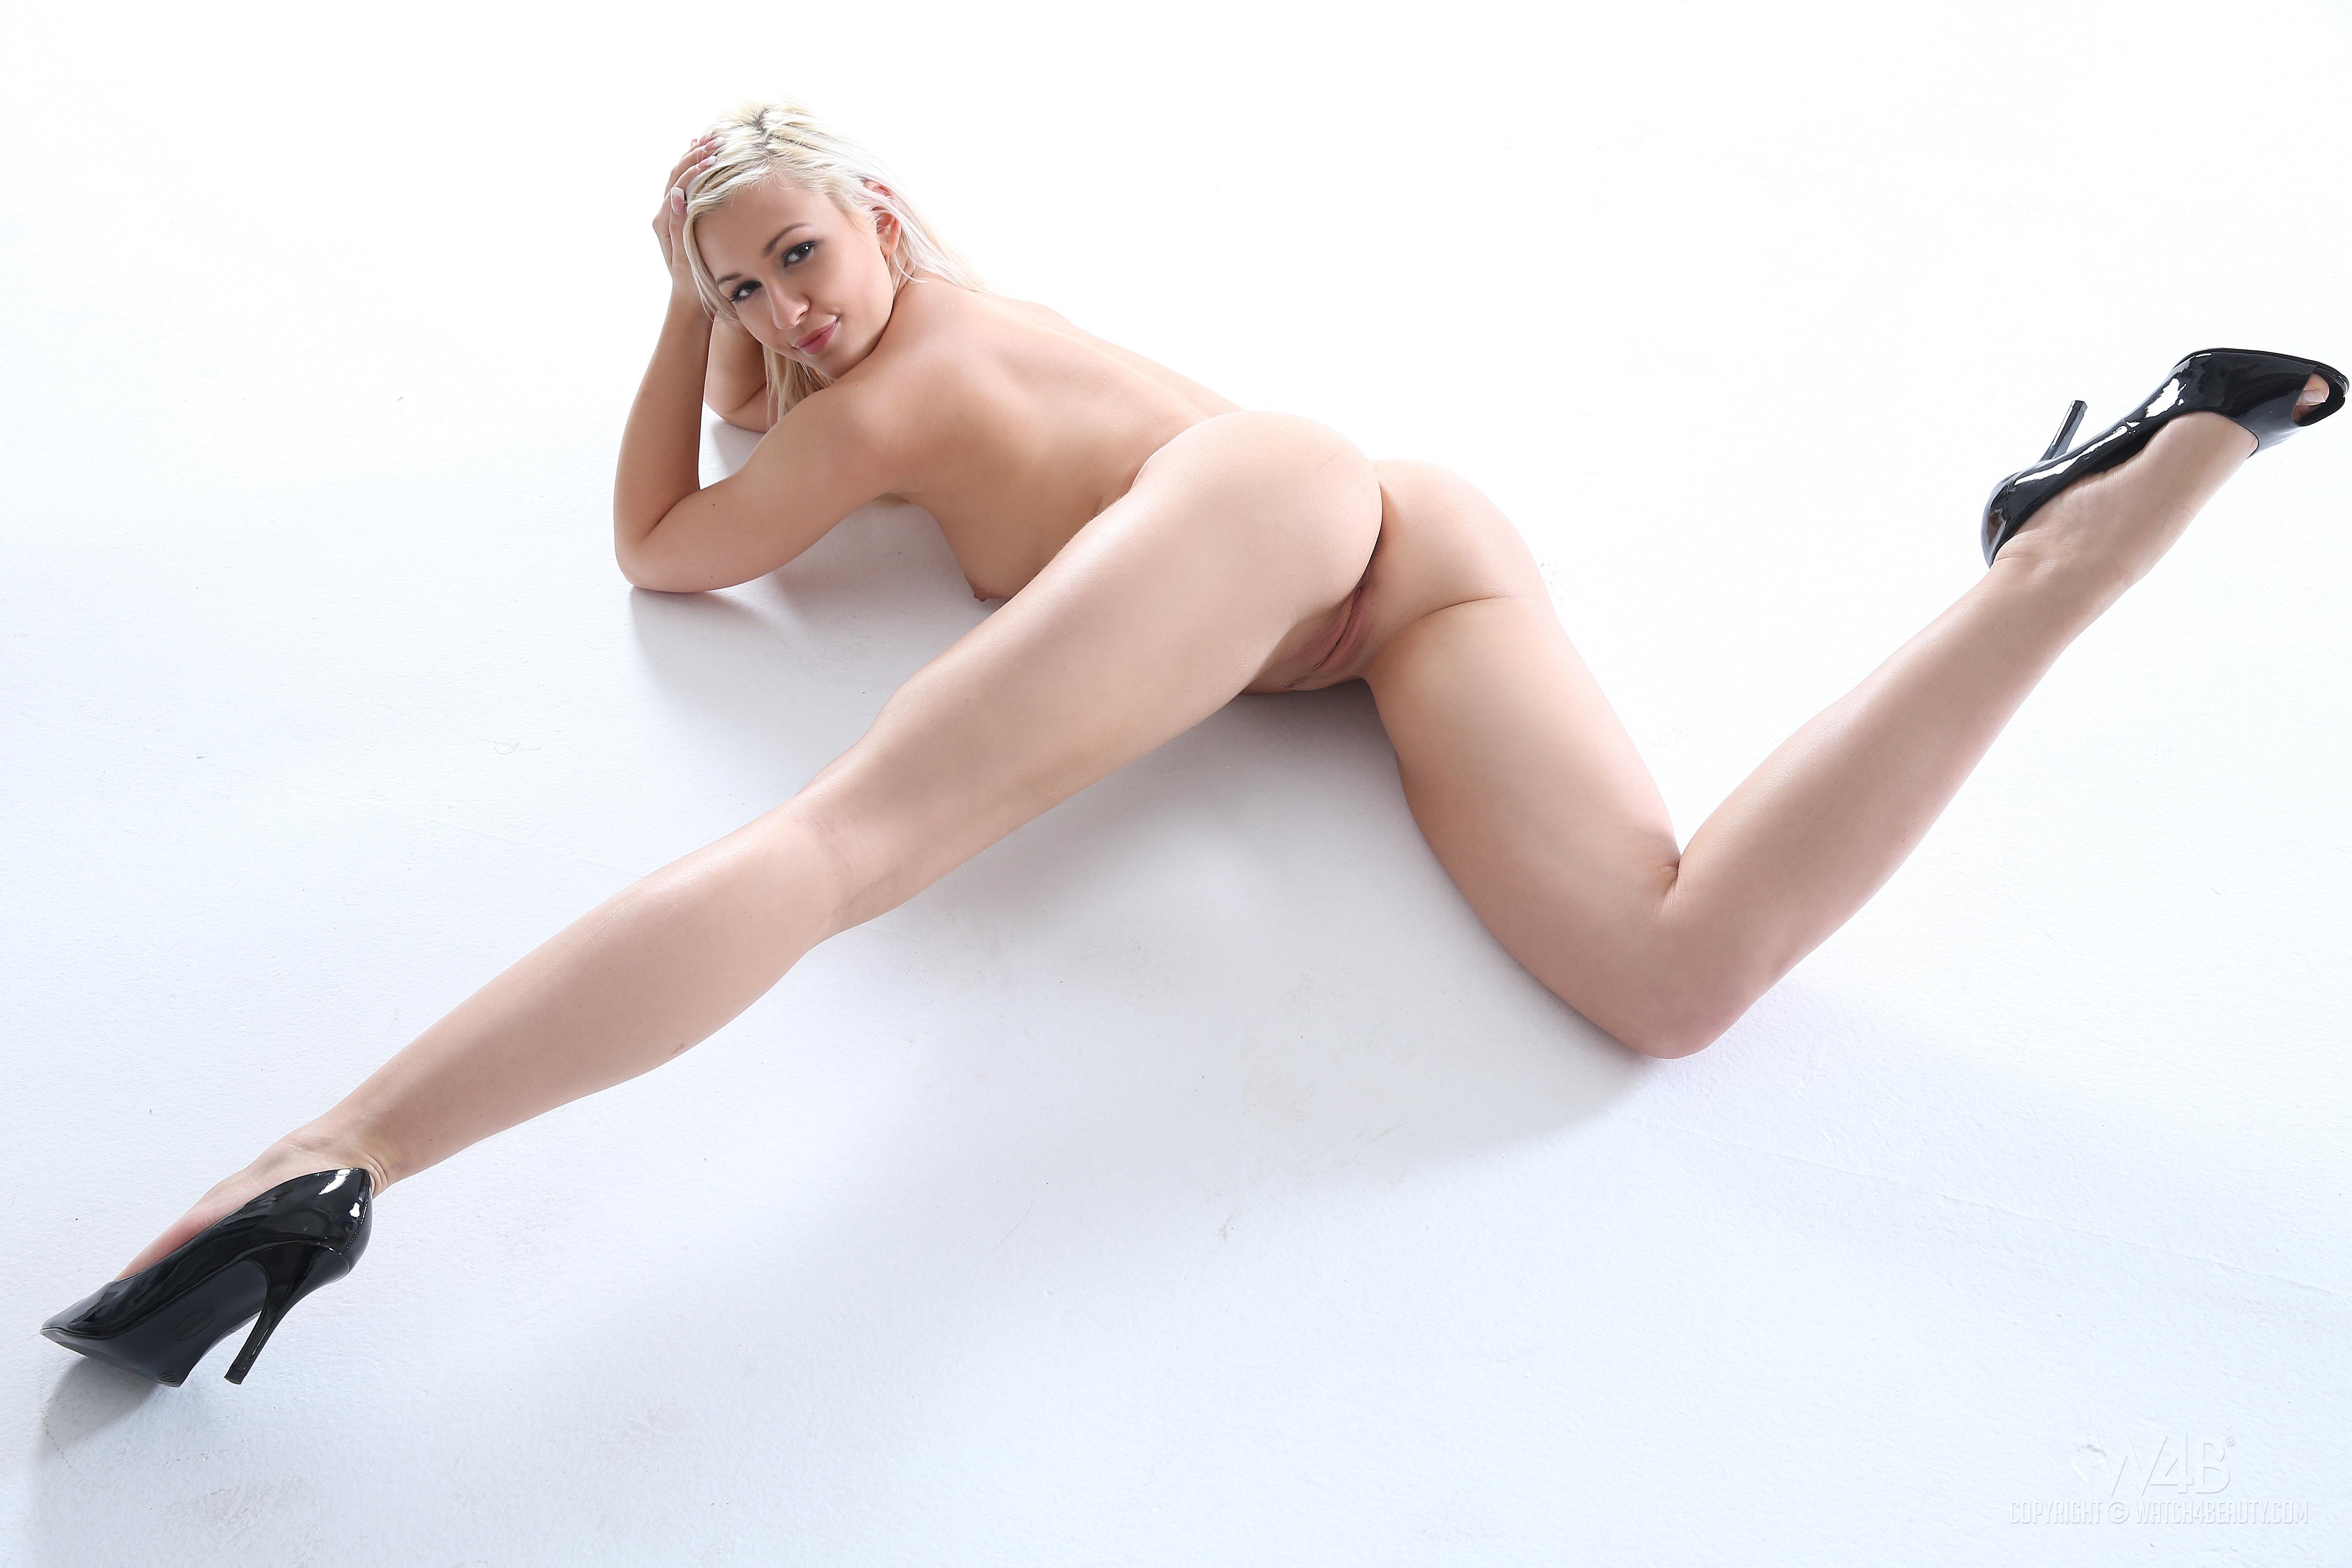 ... adult model, sexy girl, nude, naked, beautiful female legs - ID: ftop.ru/123034/1920_1080